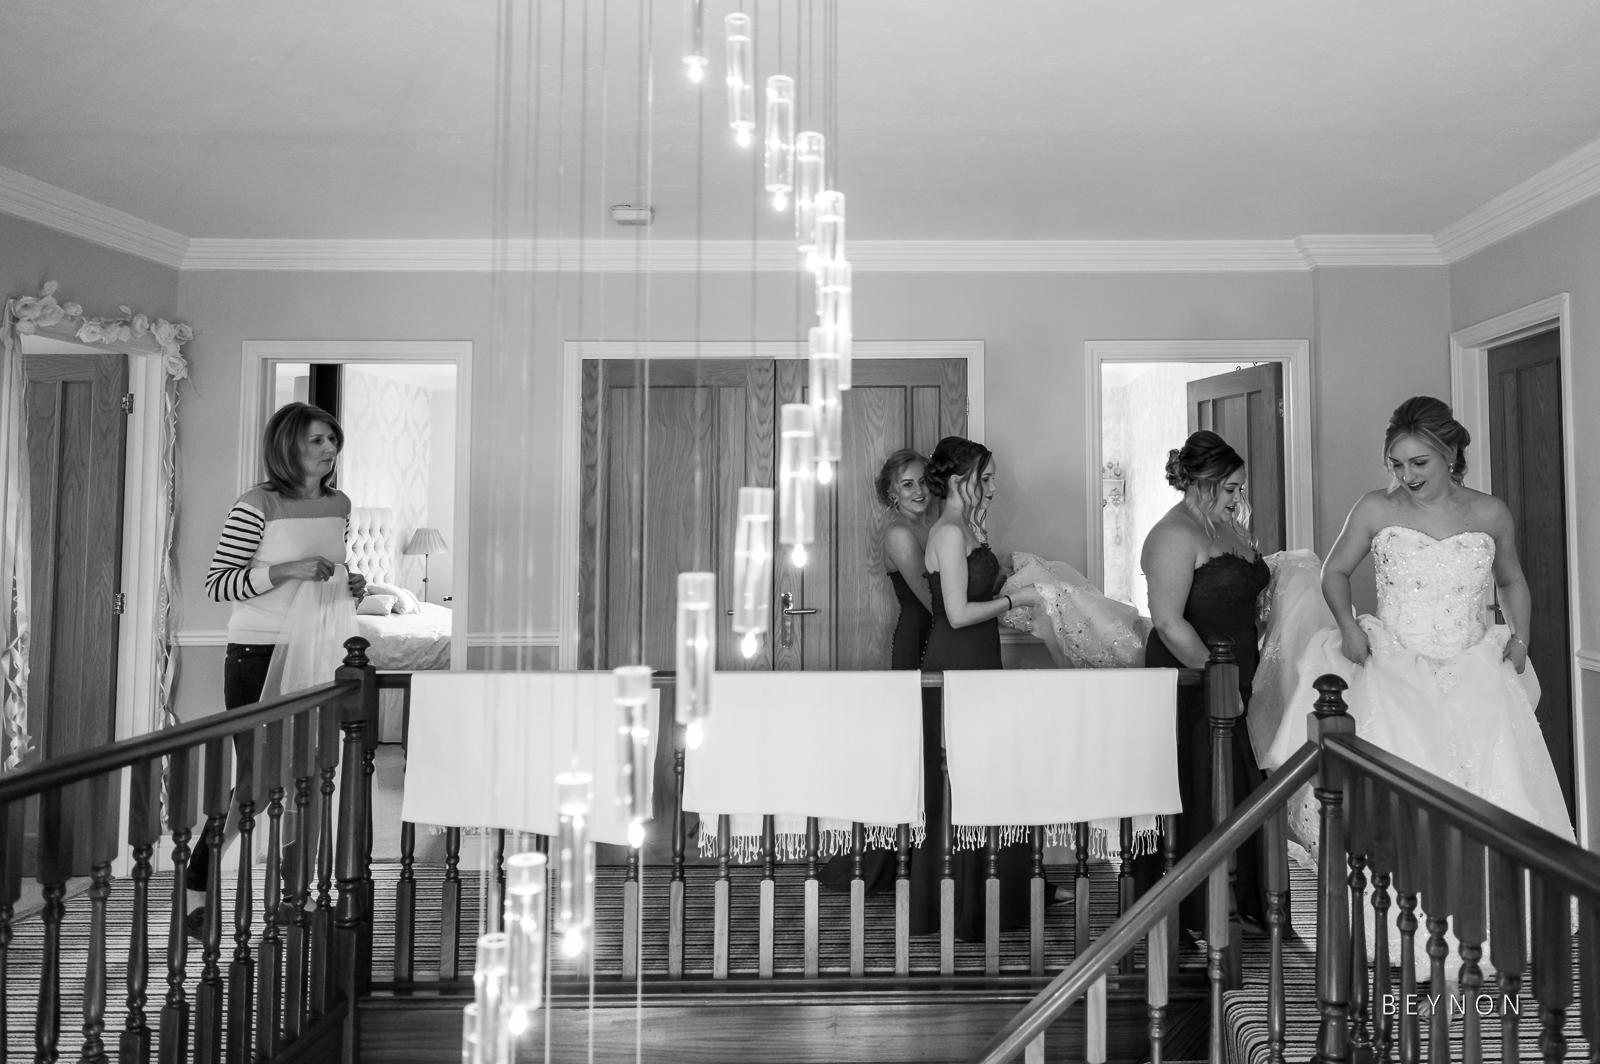 The bride walks downstairs